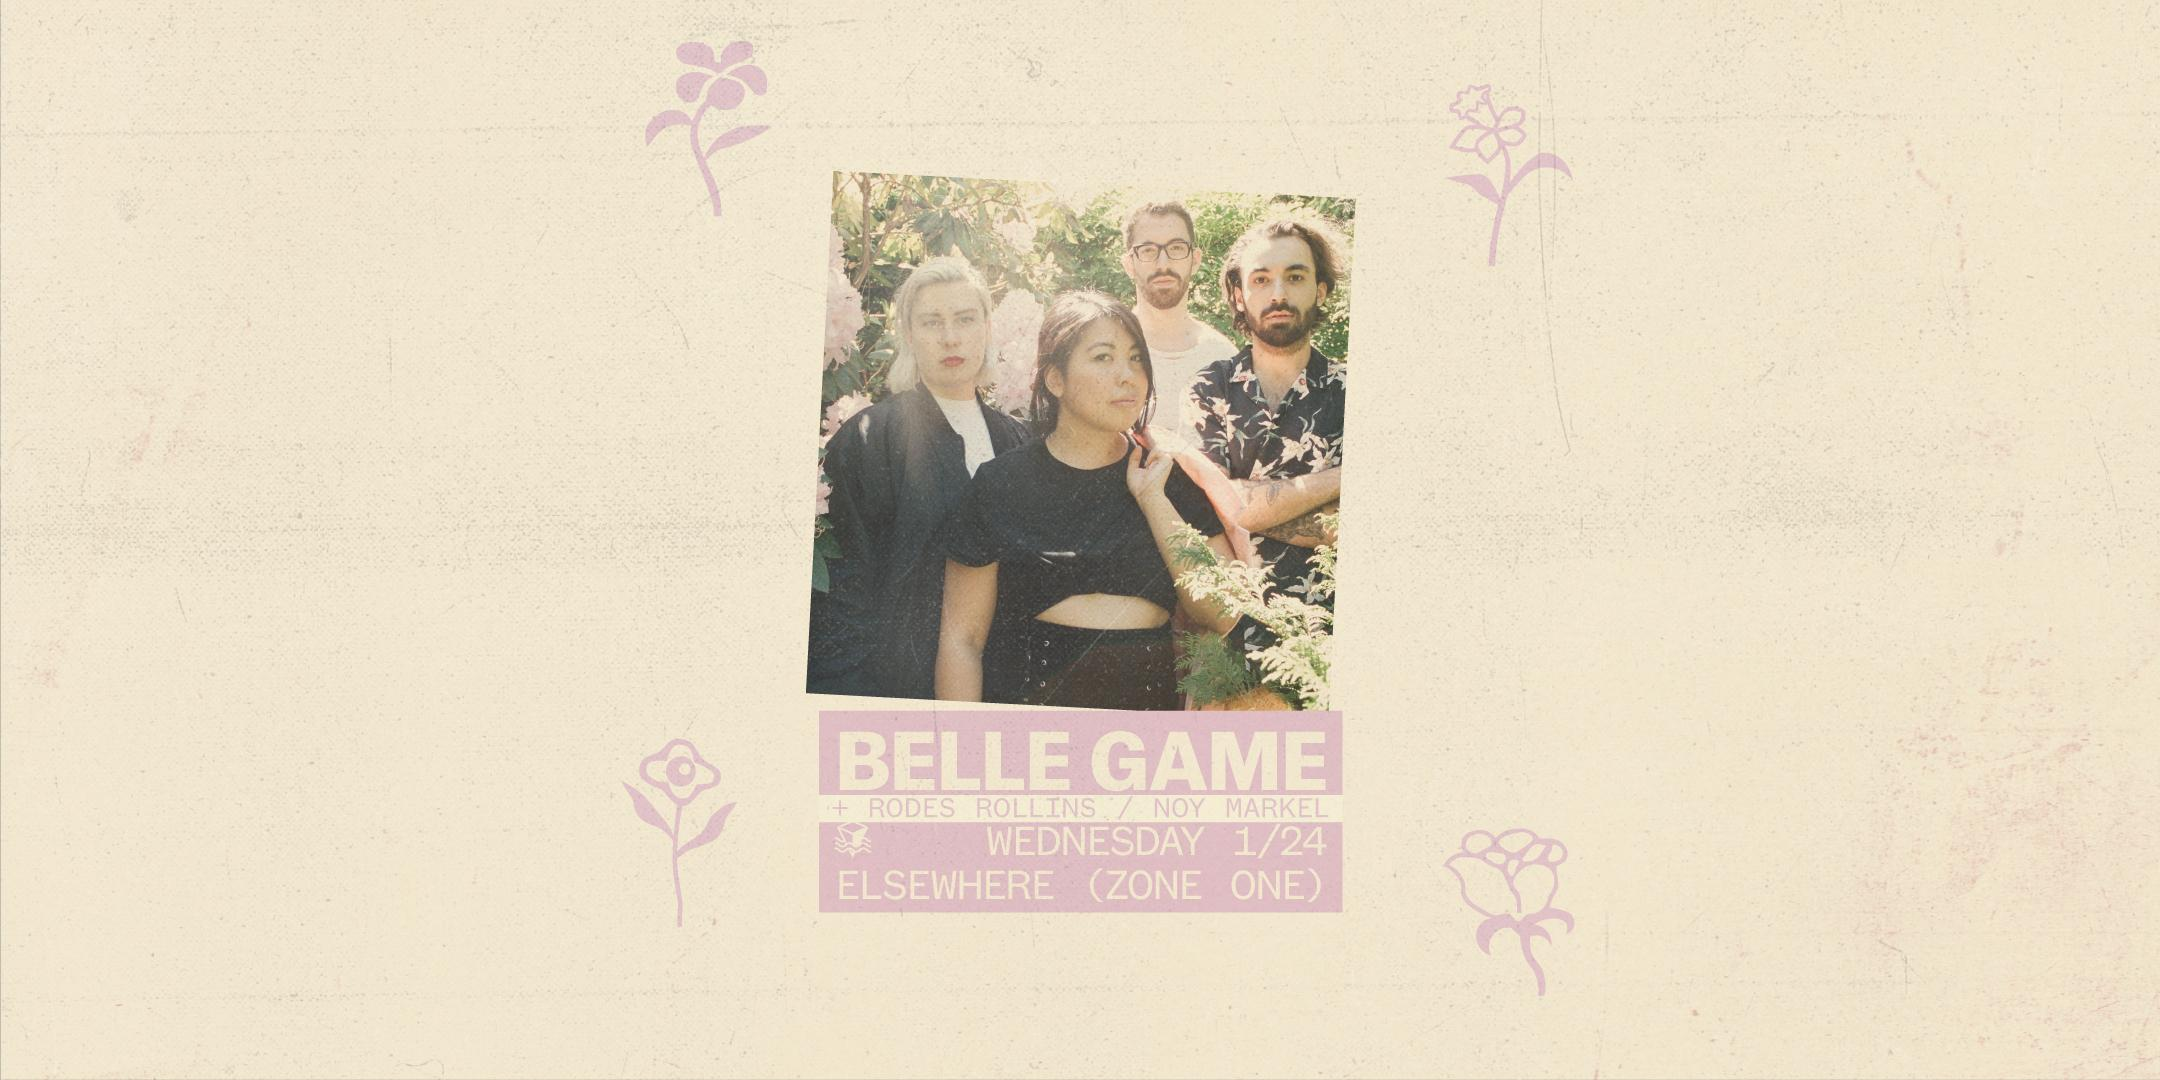 Belle Game